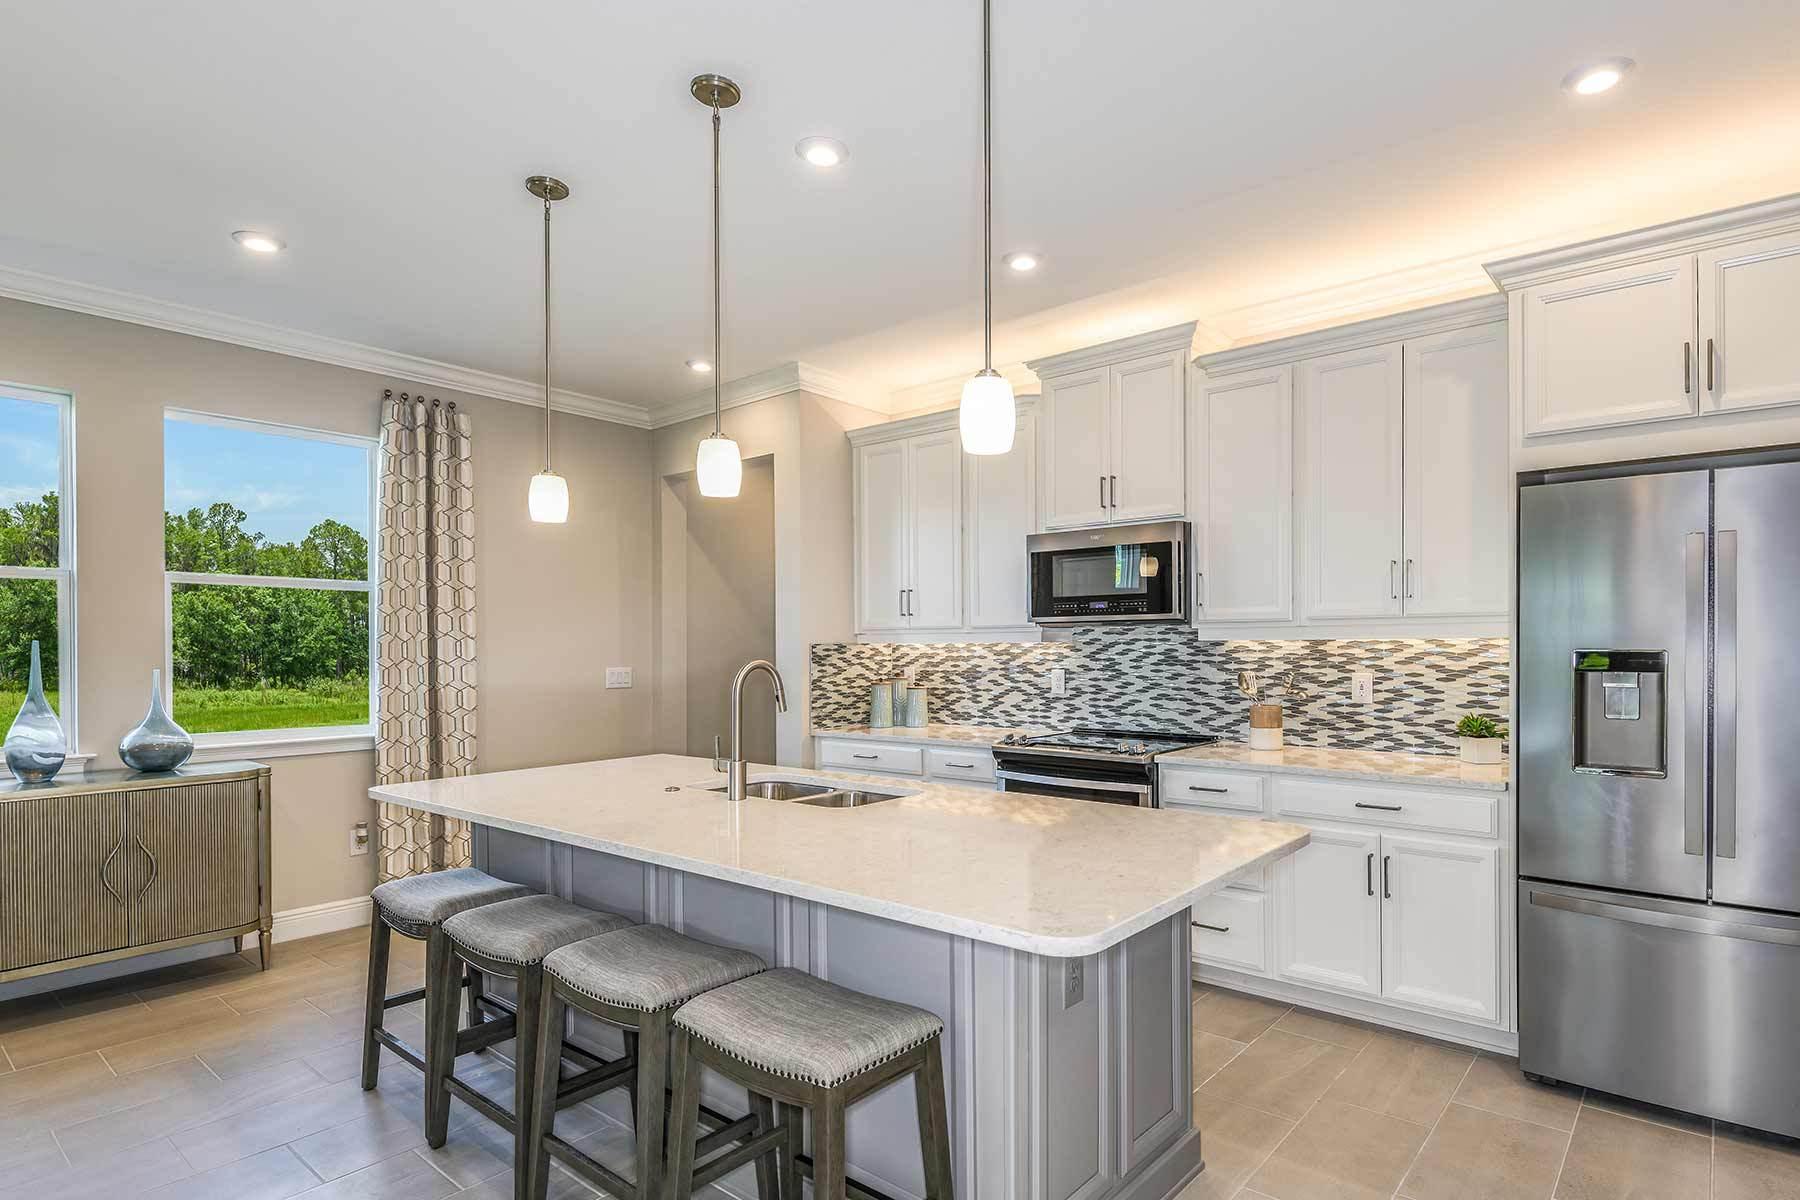 Kitchen featured in the Oceana By Mattamy Homes in Sarasota-Bradenton, FL